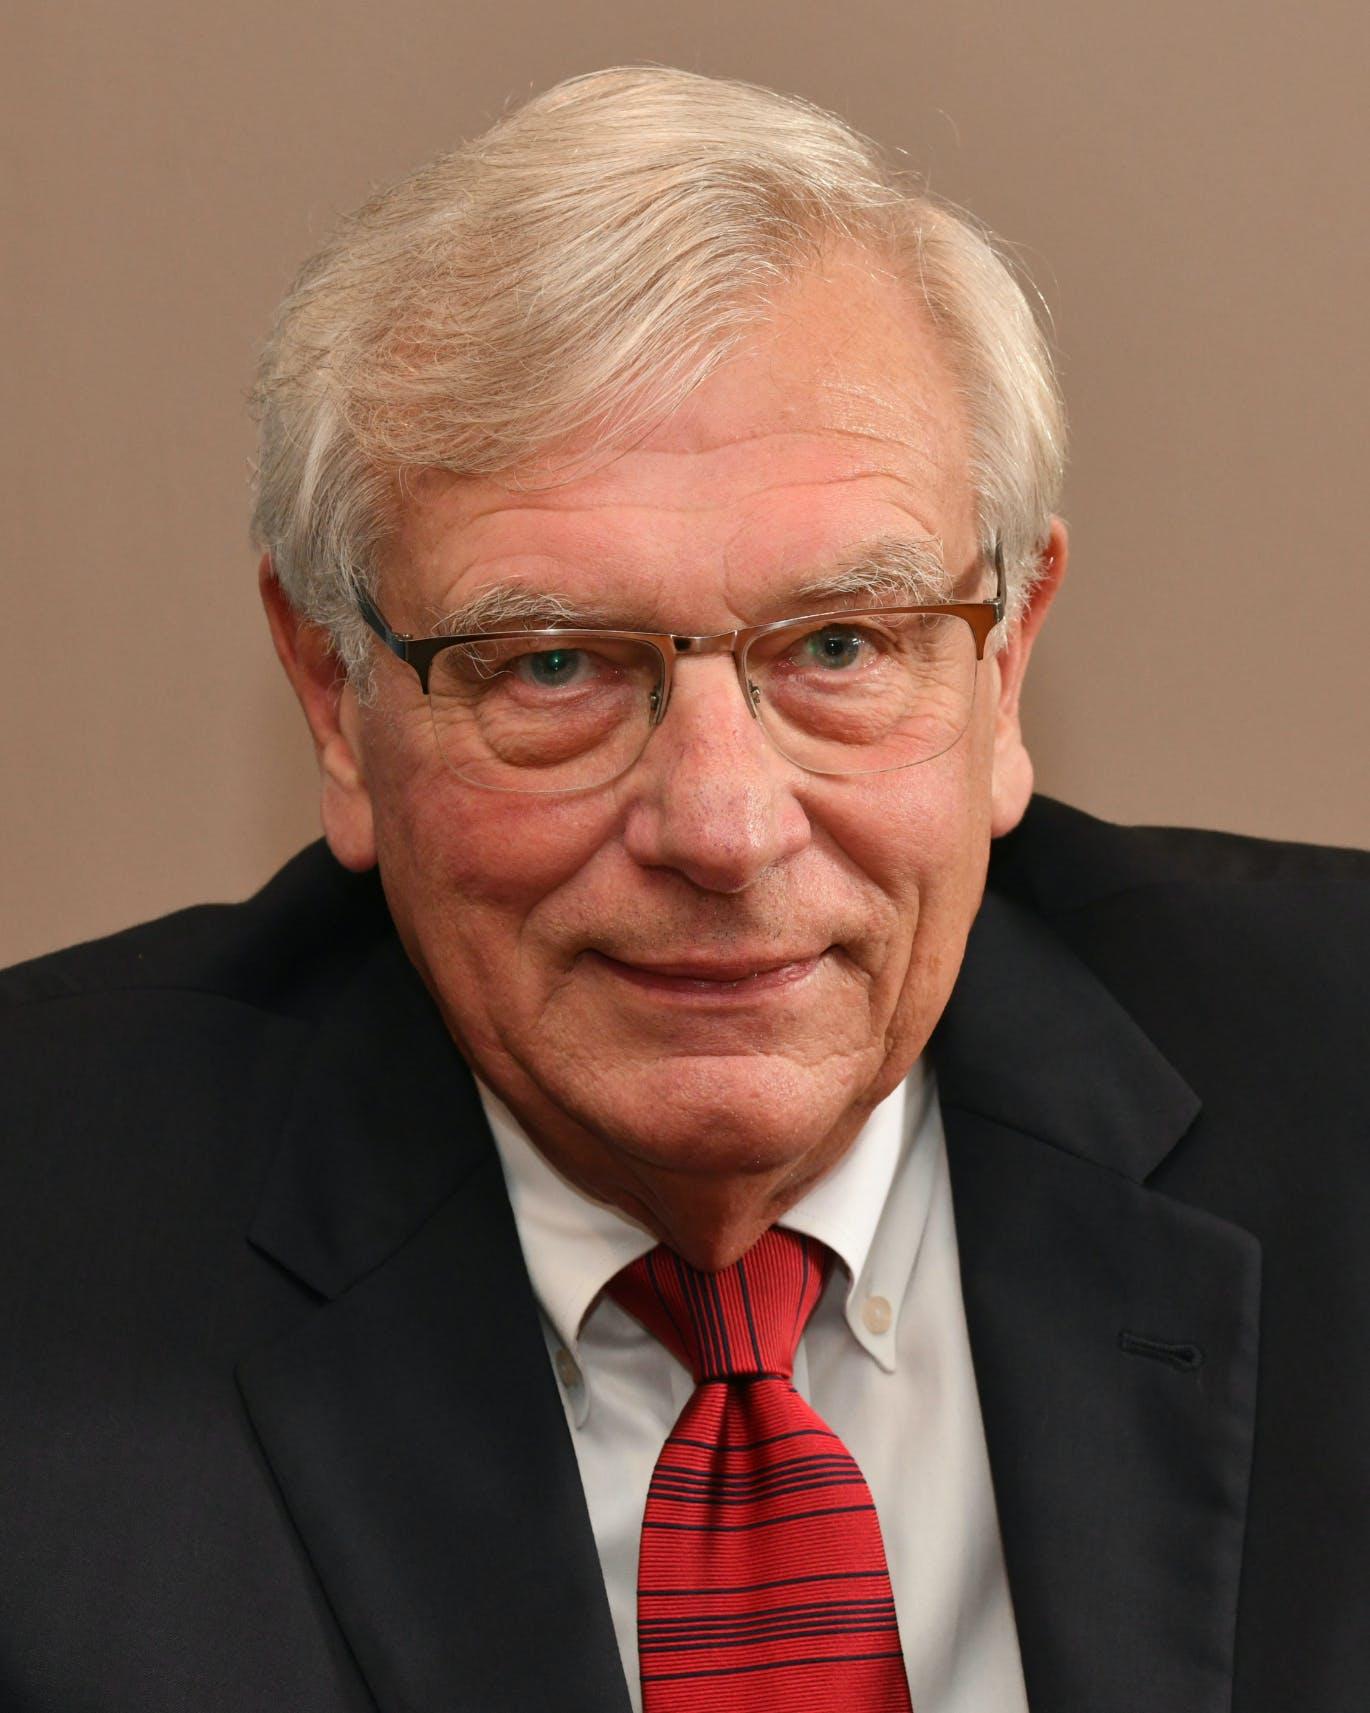 Profile photo of Tom Cross